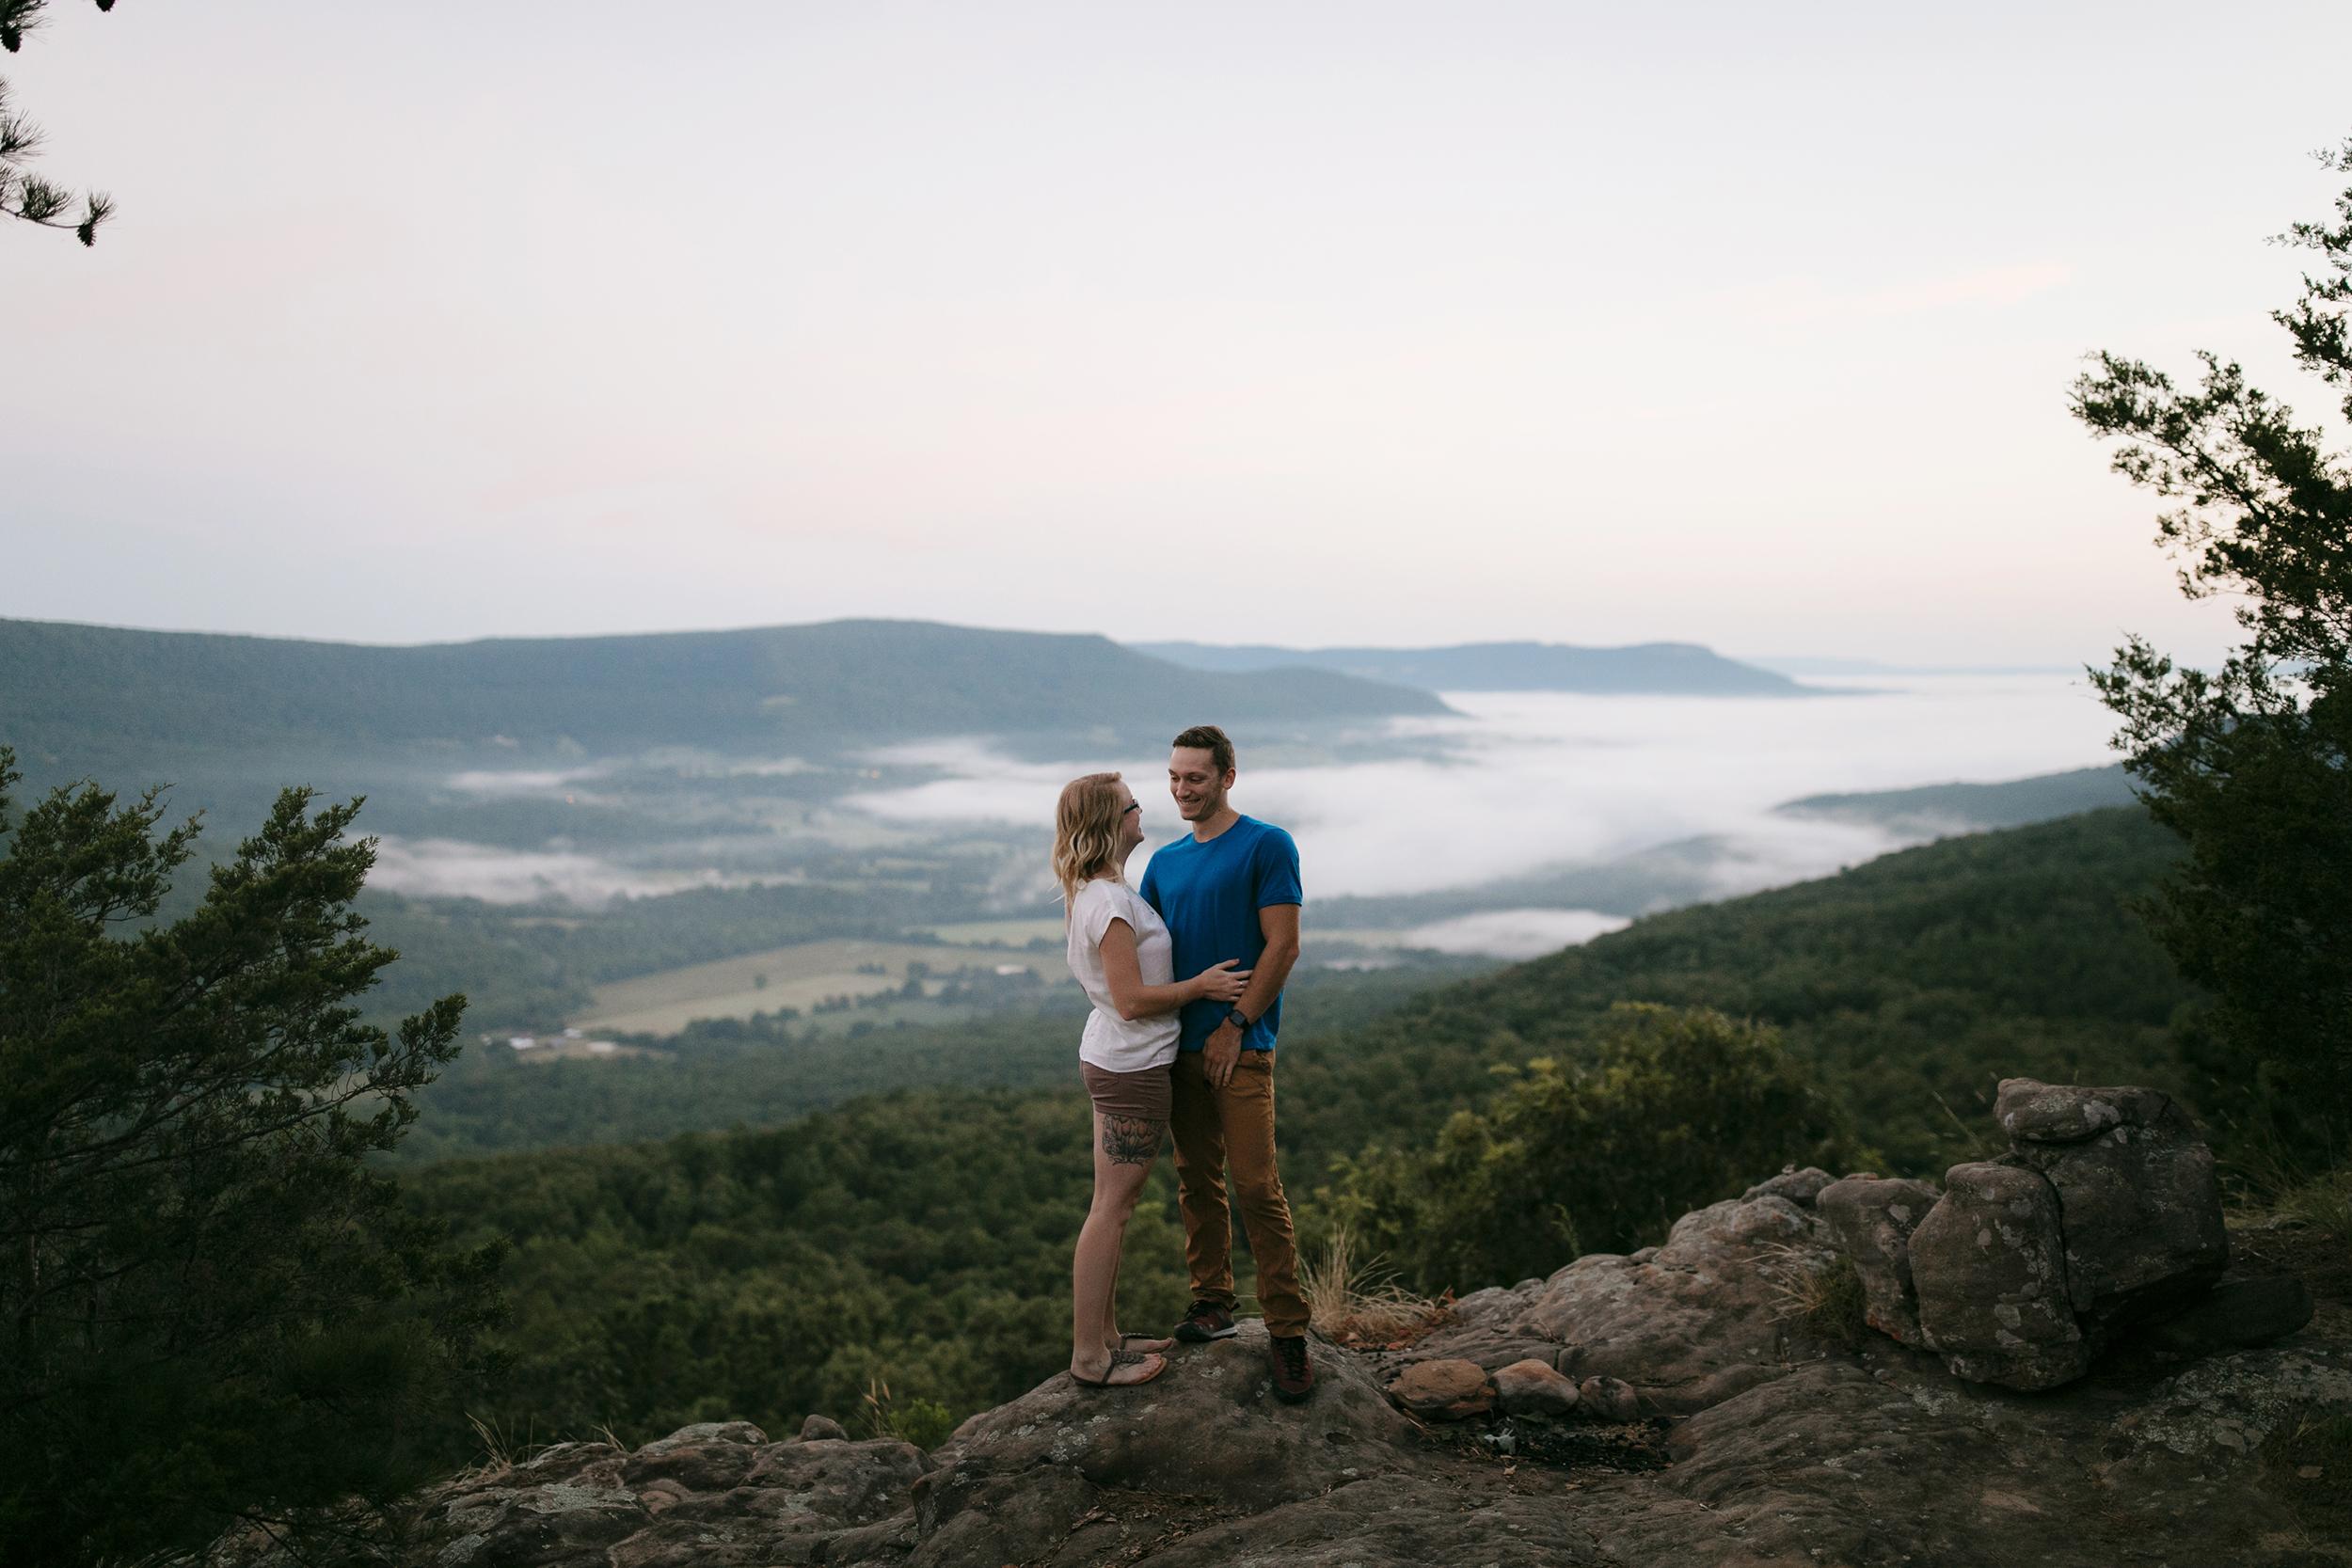 Buffalo-River-Arkansas-Sams-Throne-Adventure-Engagement-Photographer63.JPG